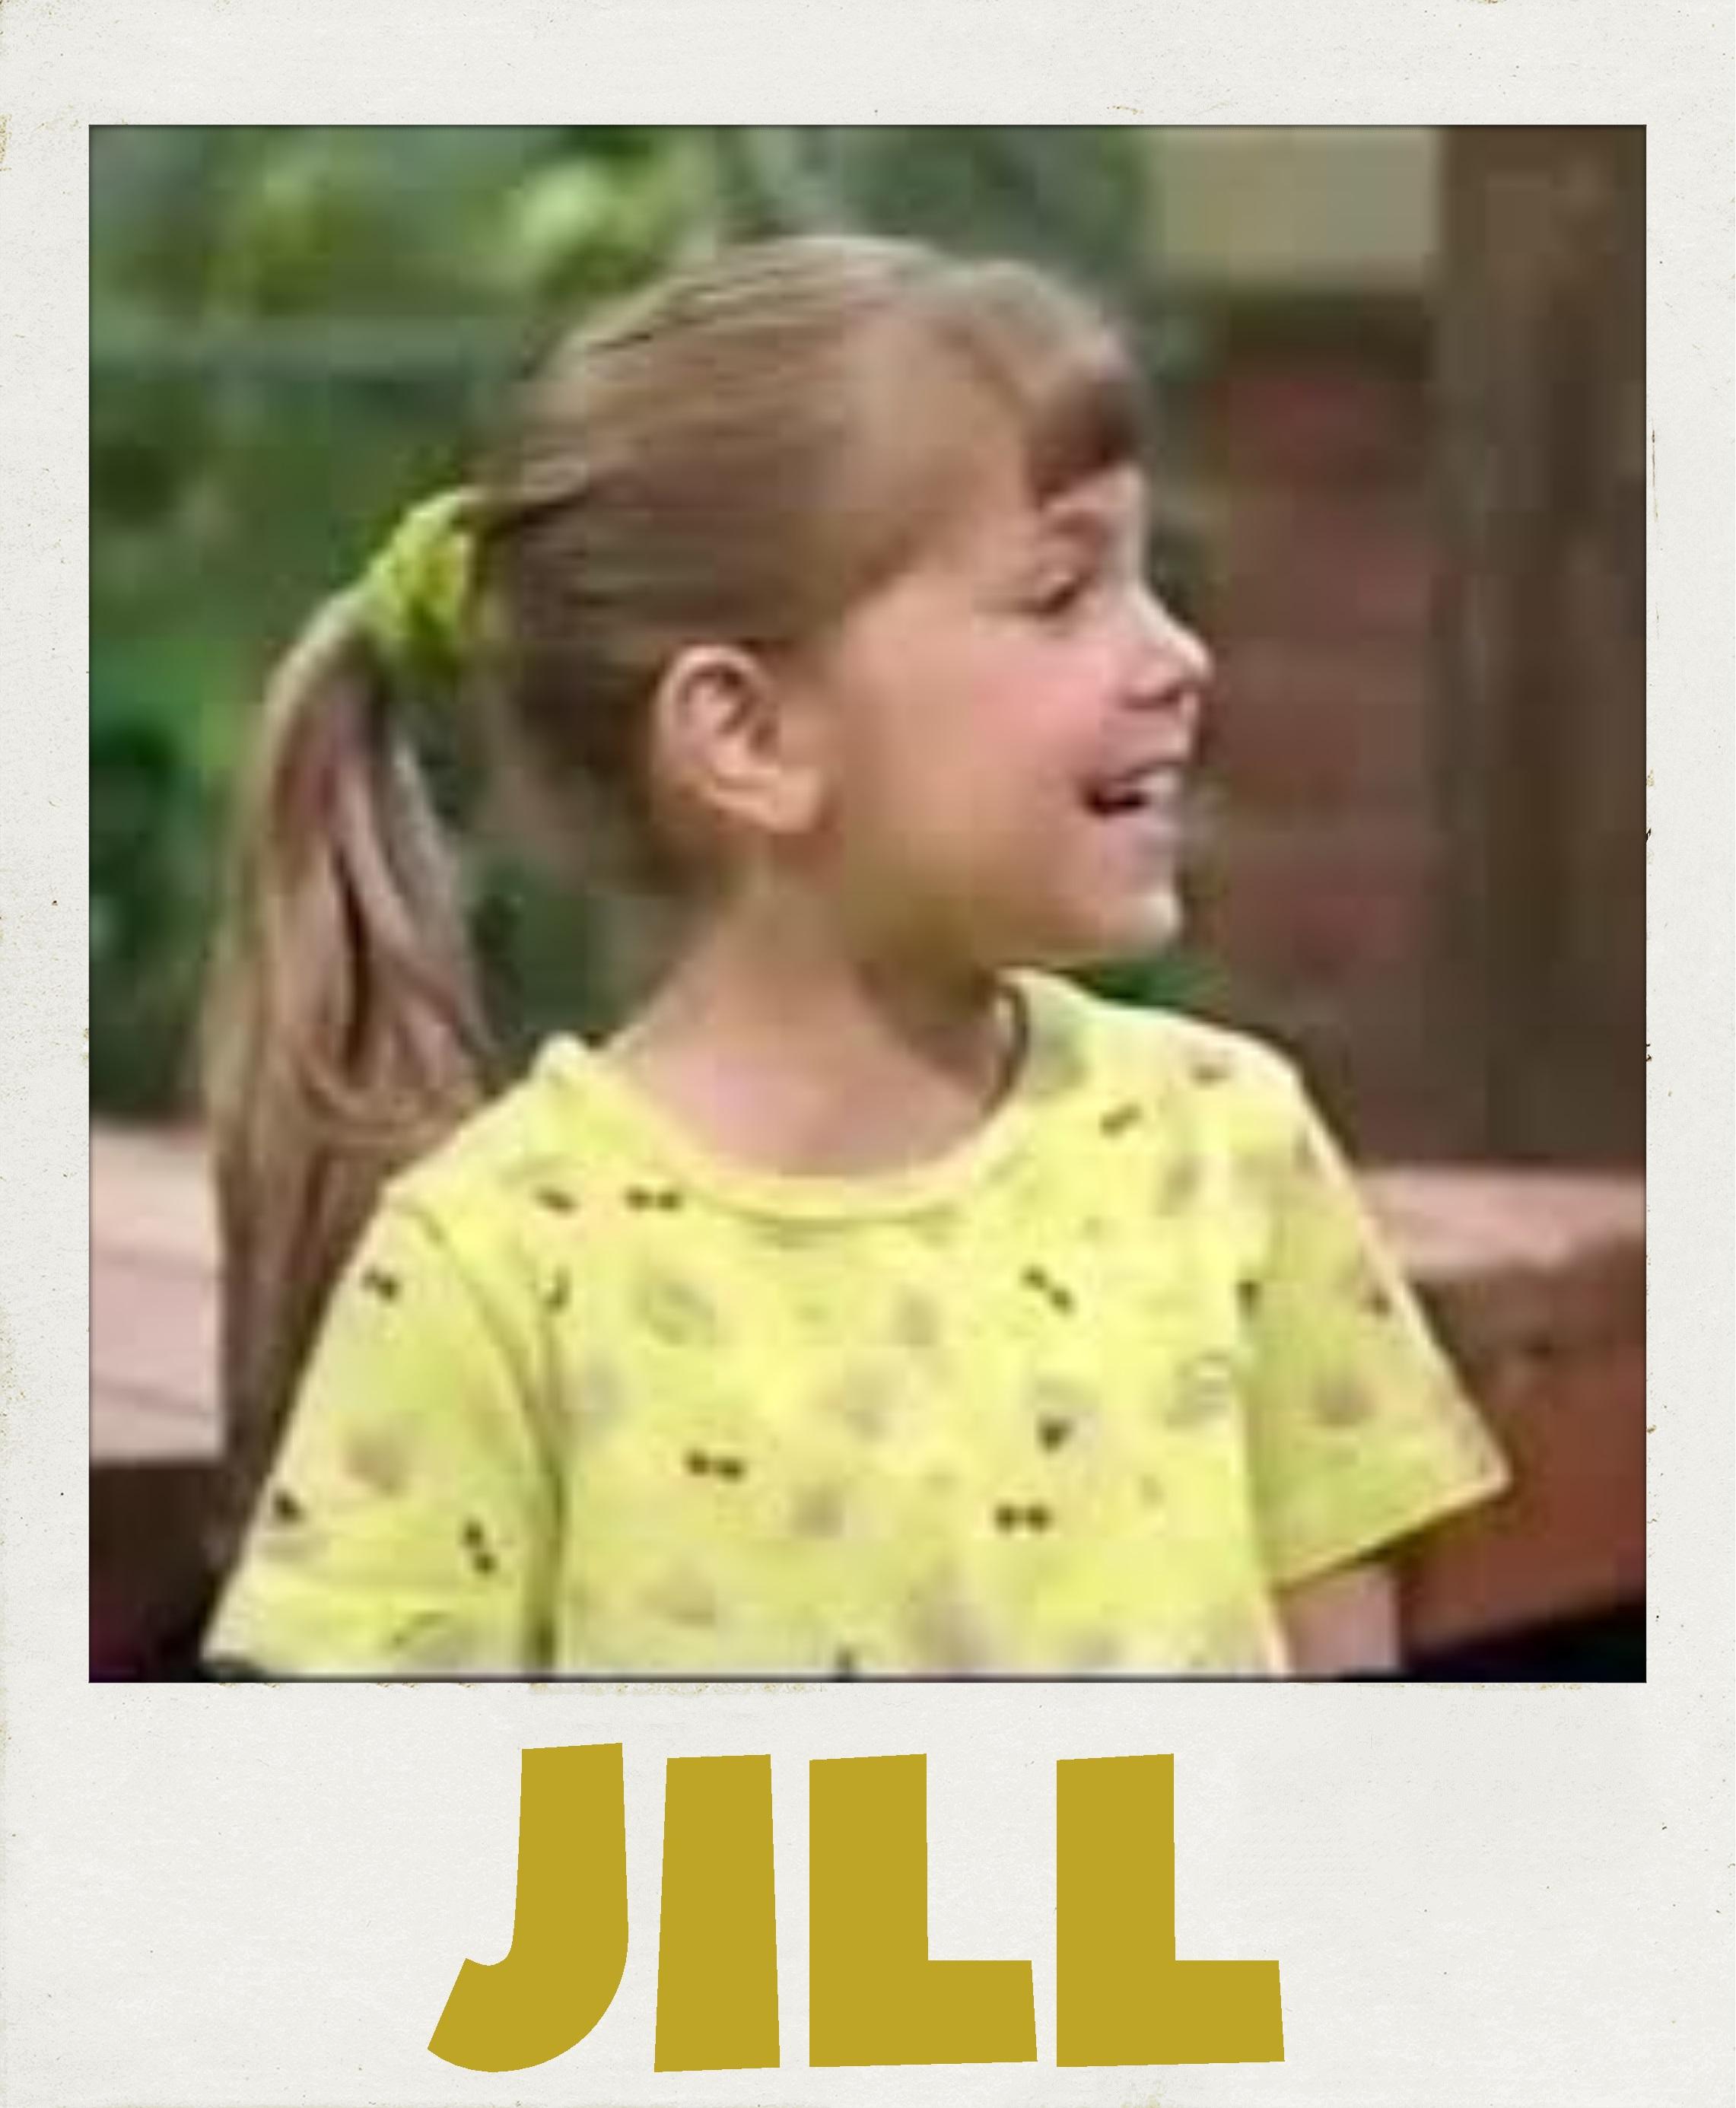 Jill (Lana Whittington)